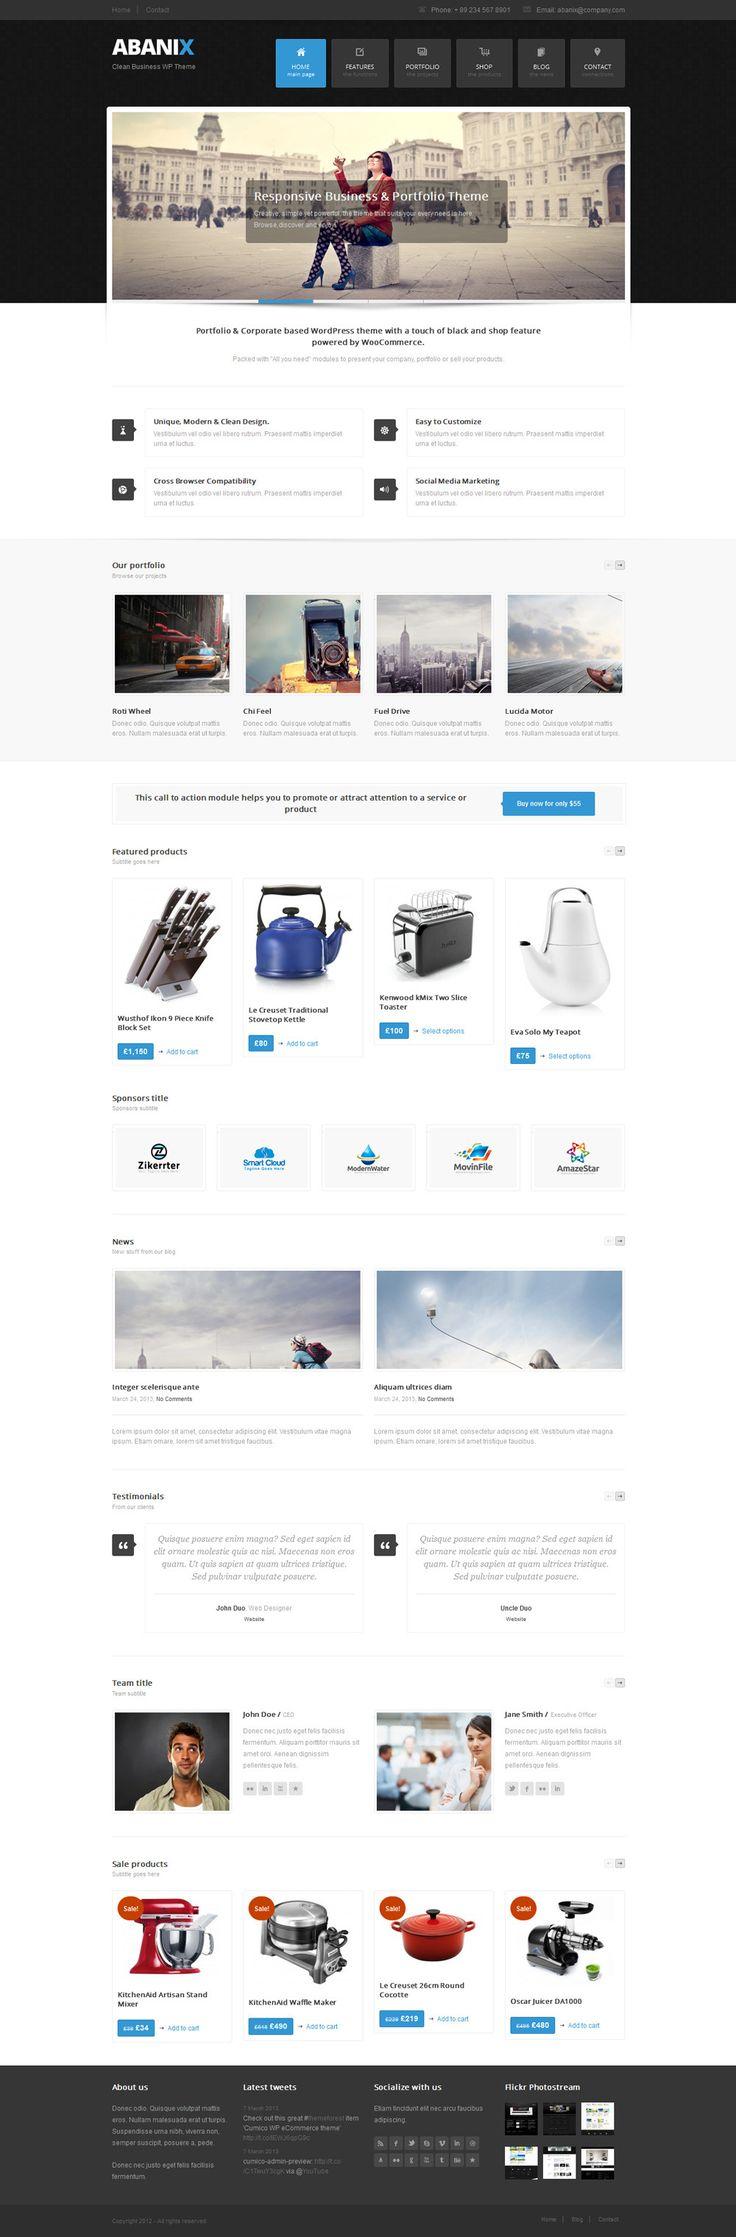 Abanix Business, Portfolio & Shop  #wordpress #theme #website #template #responsive #design #webdesign #flat #flatdesign #portfolio #shop #modern #metro